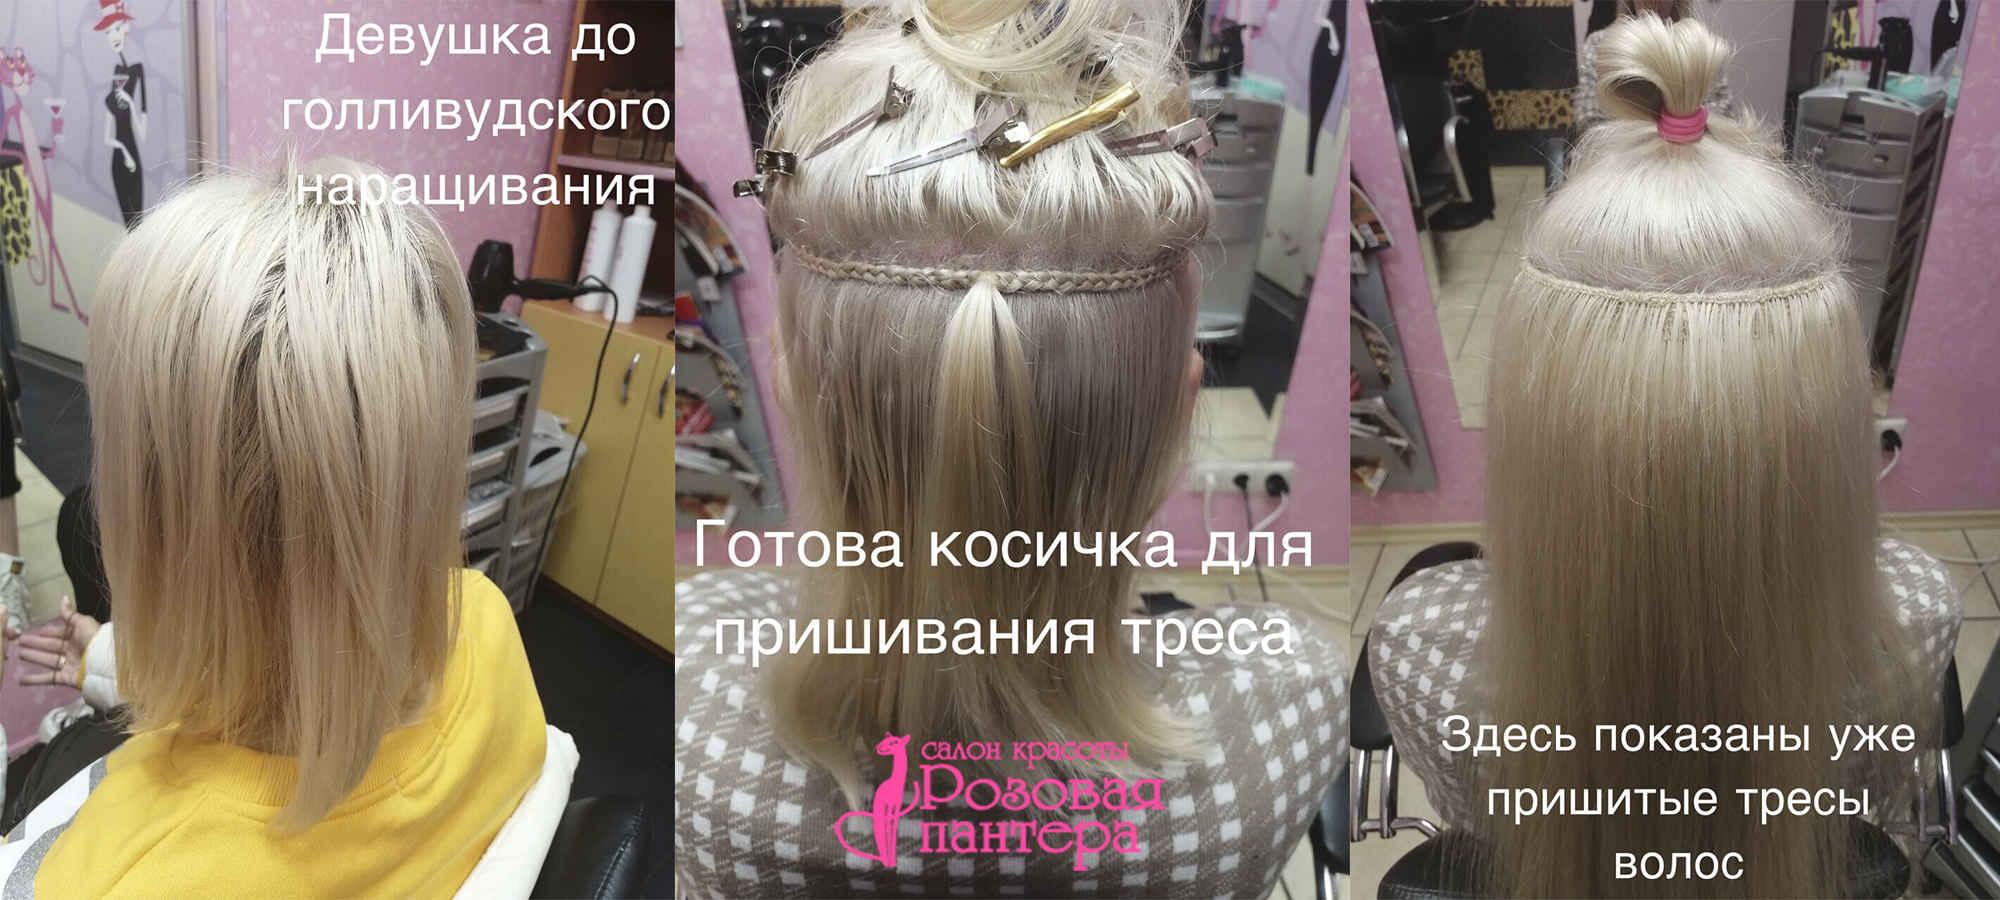 Голливудское наращивание волос в Минске фото до и после